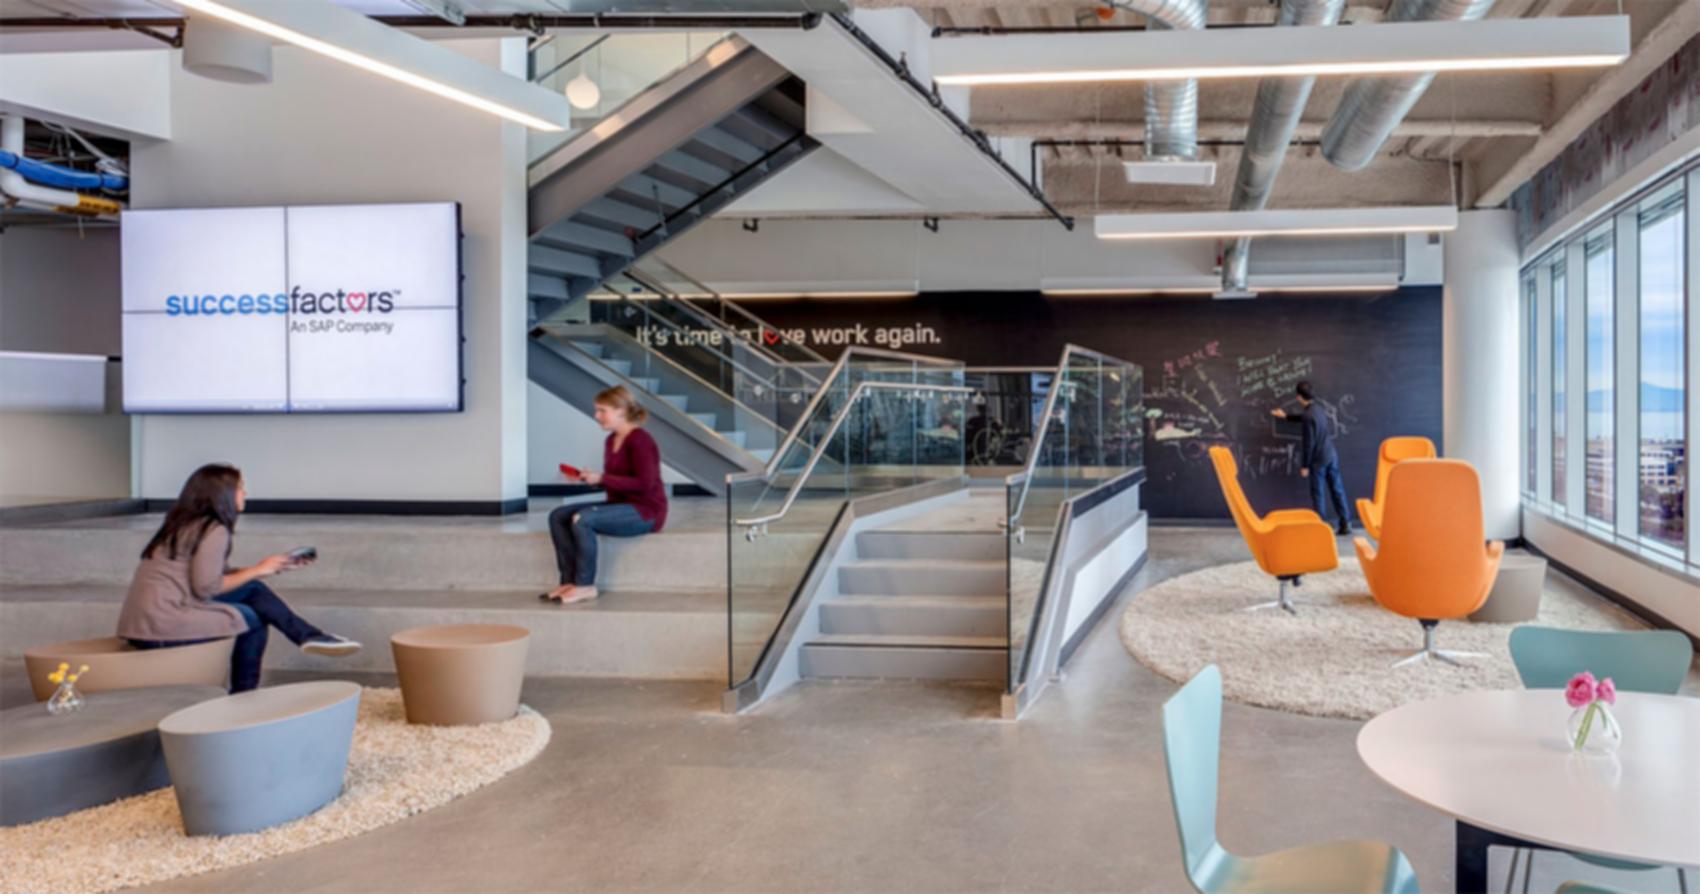 SuccessFactors Office - Interior